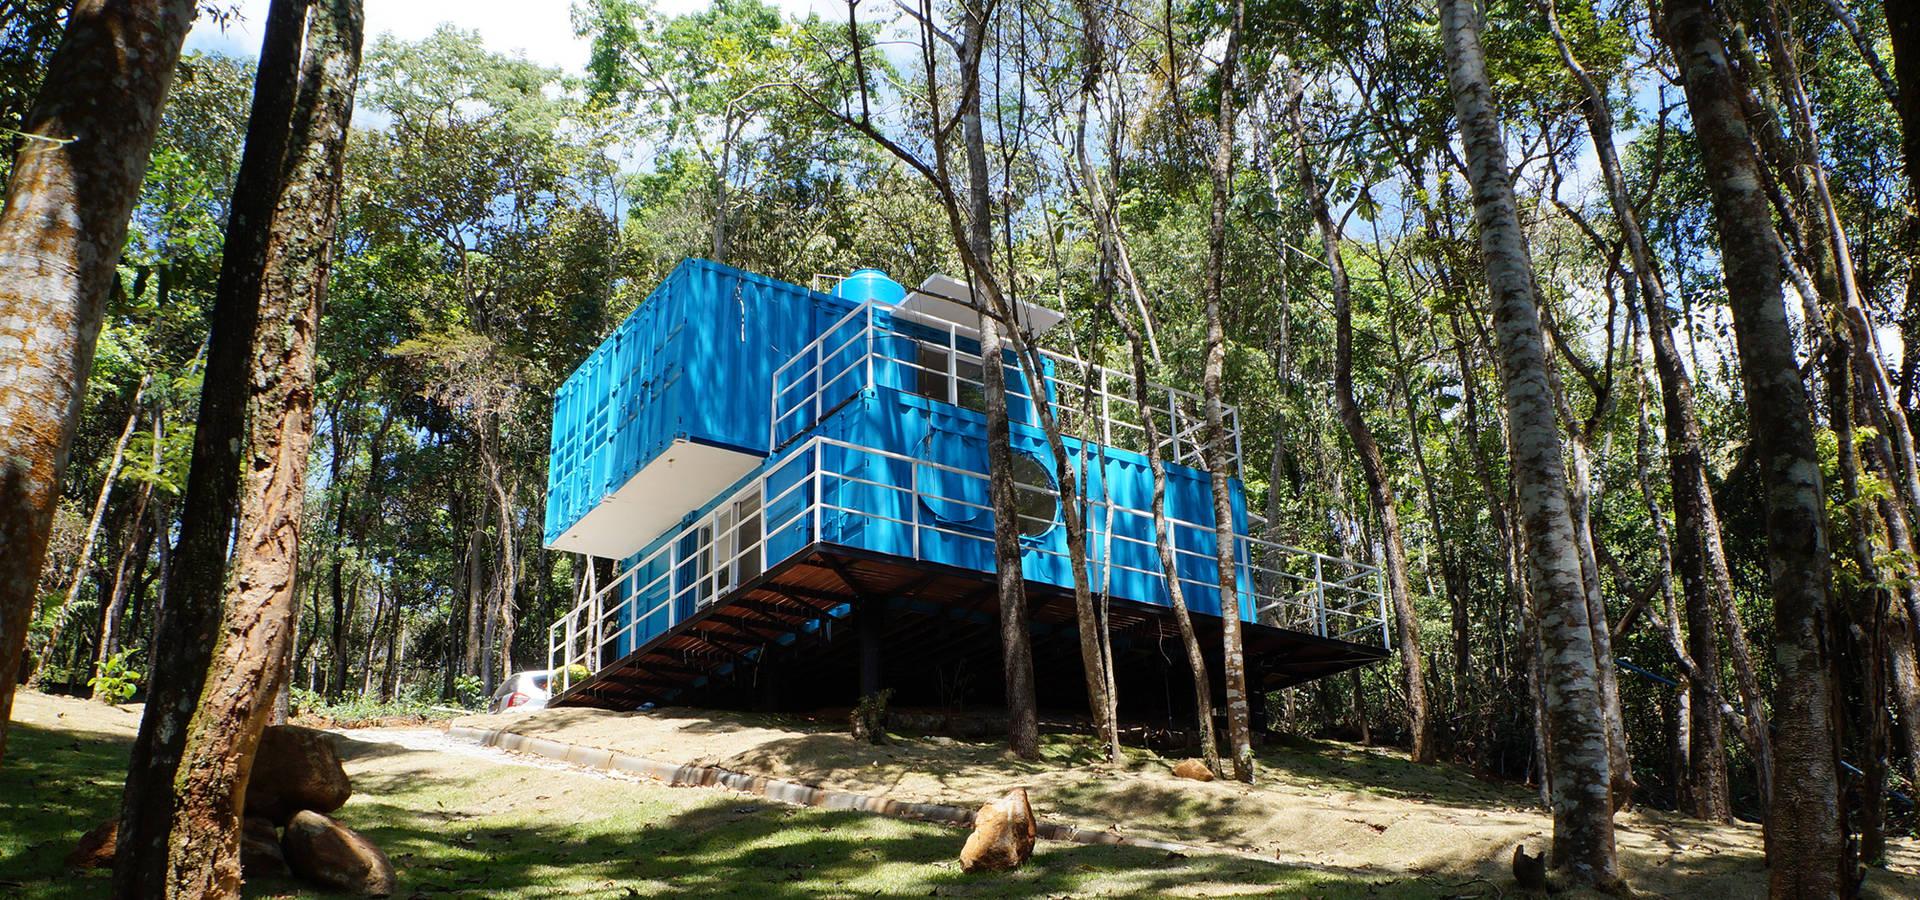 Edificare Containers Transformados